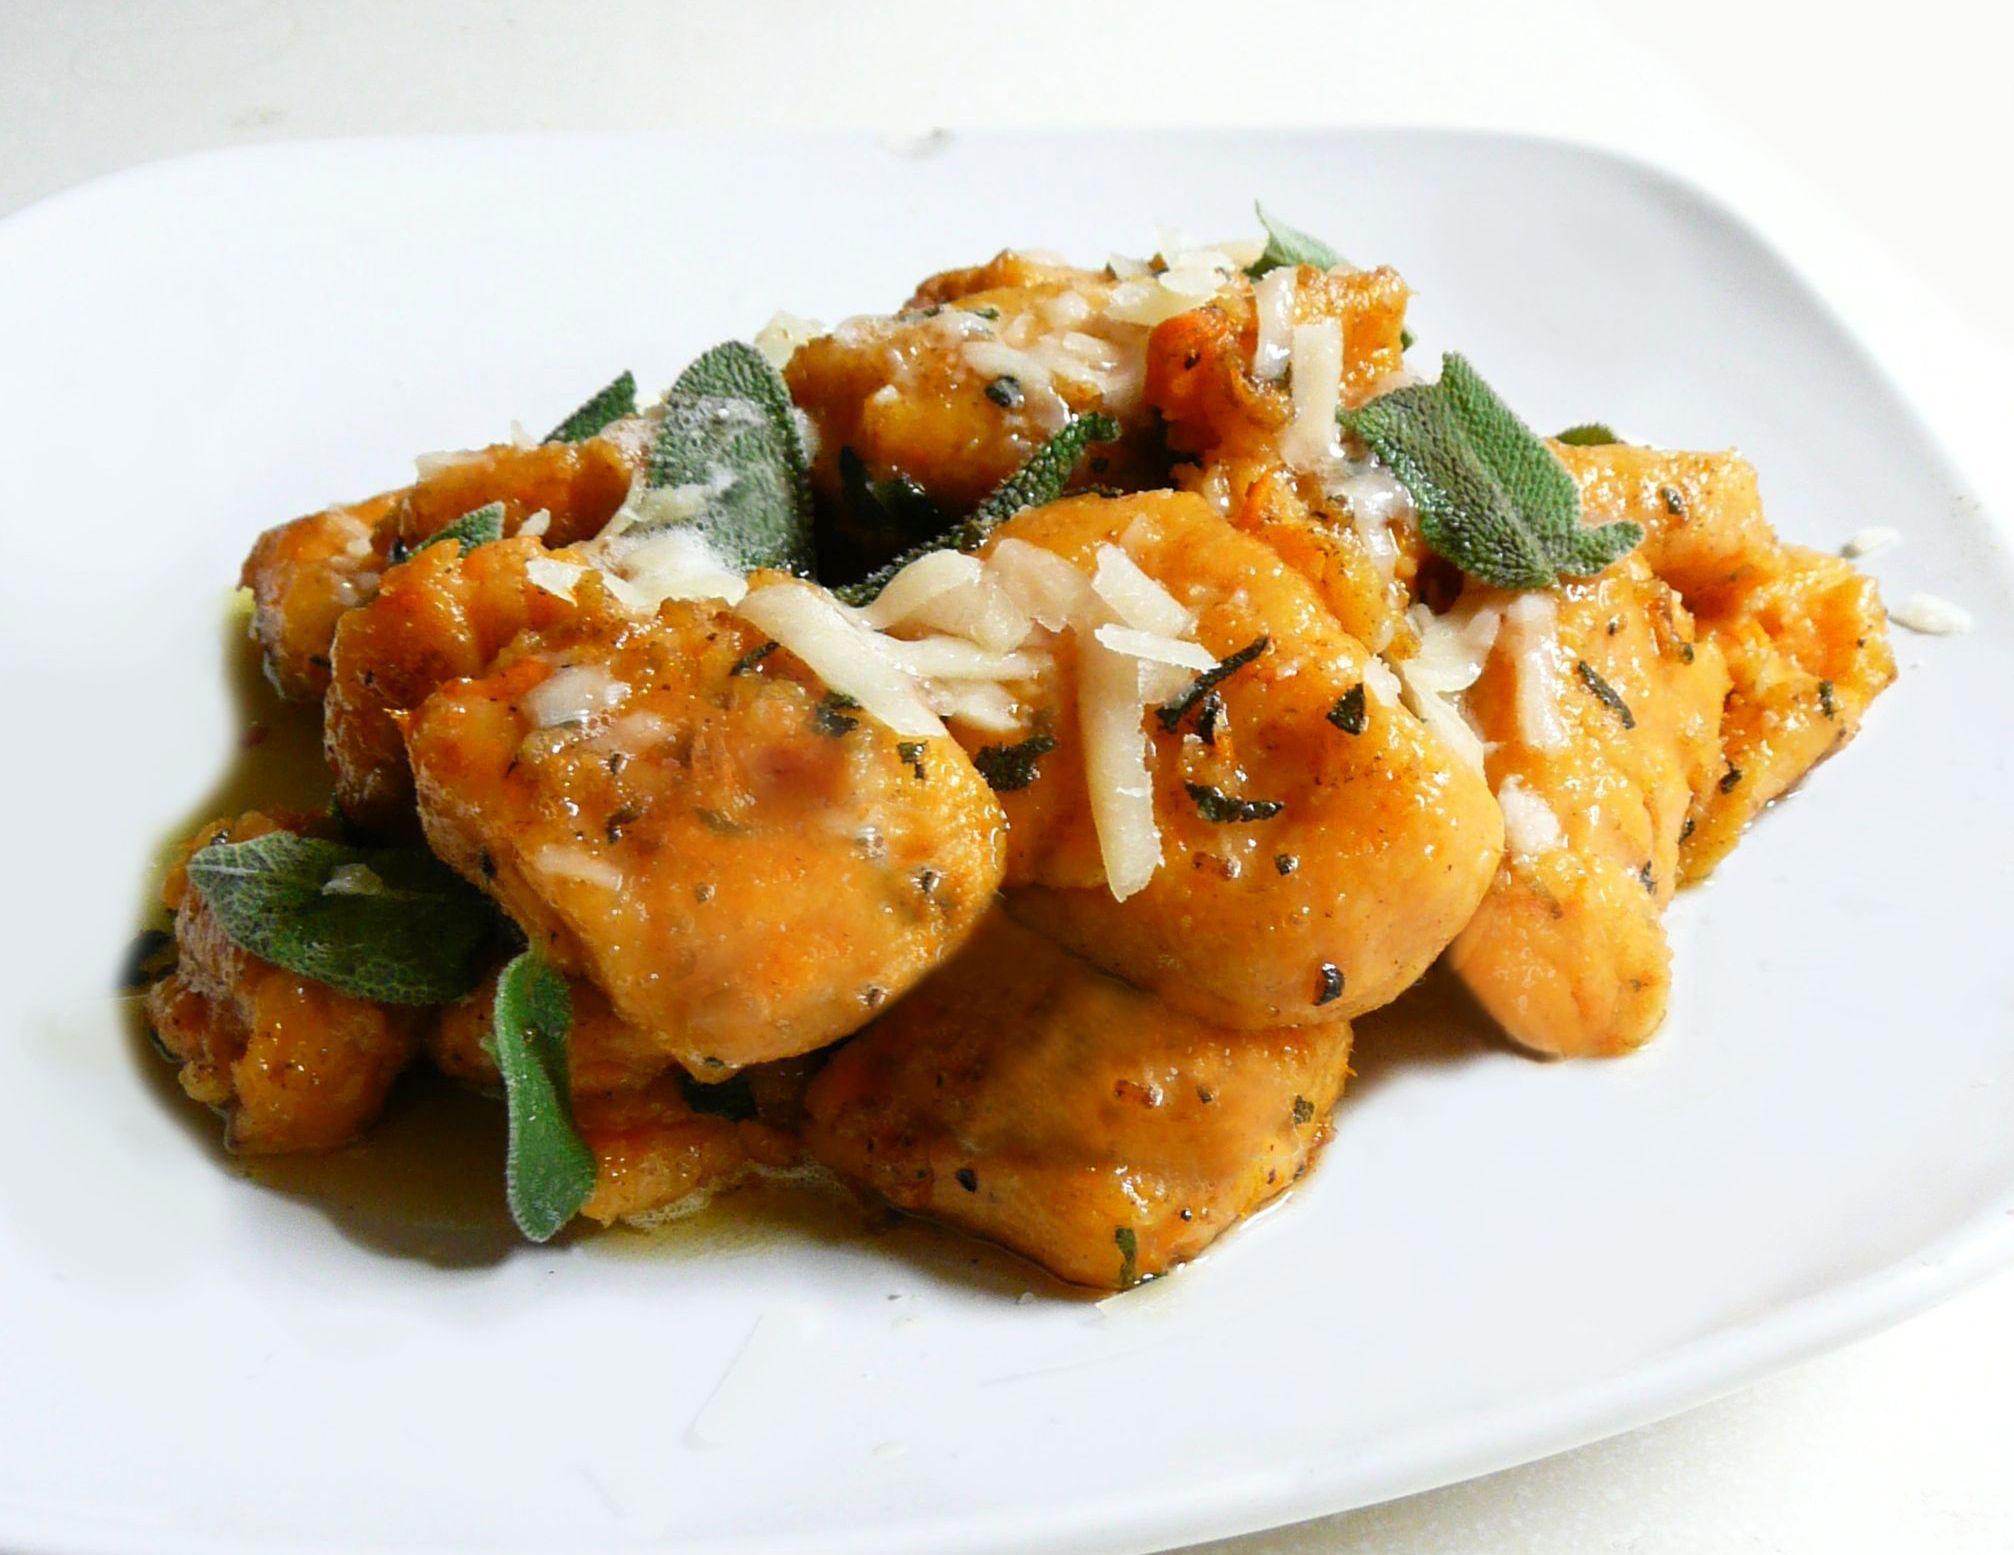 Gnocchi | The Partial Ingredients